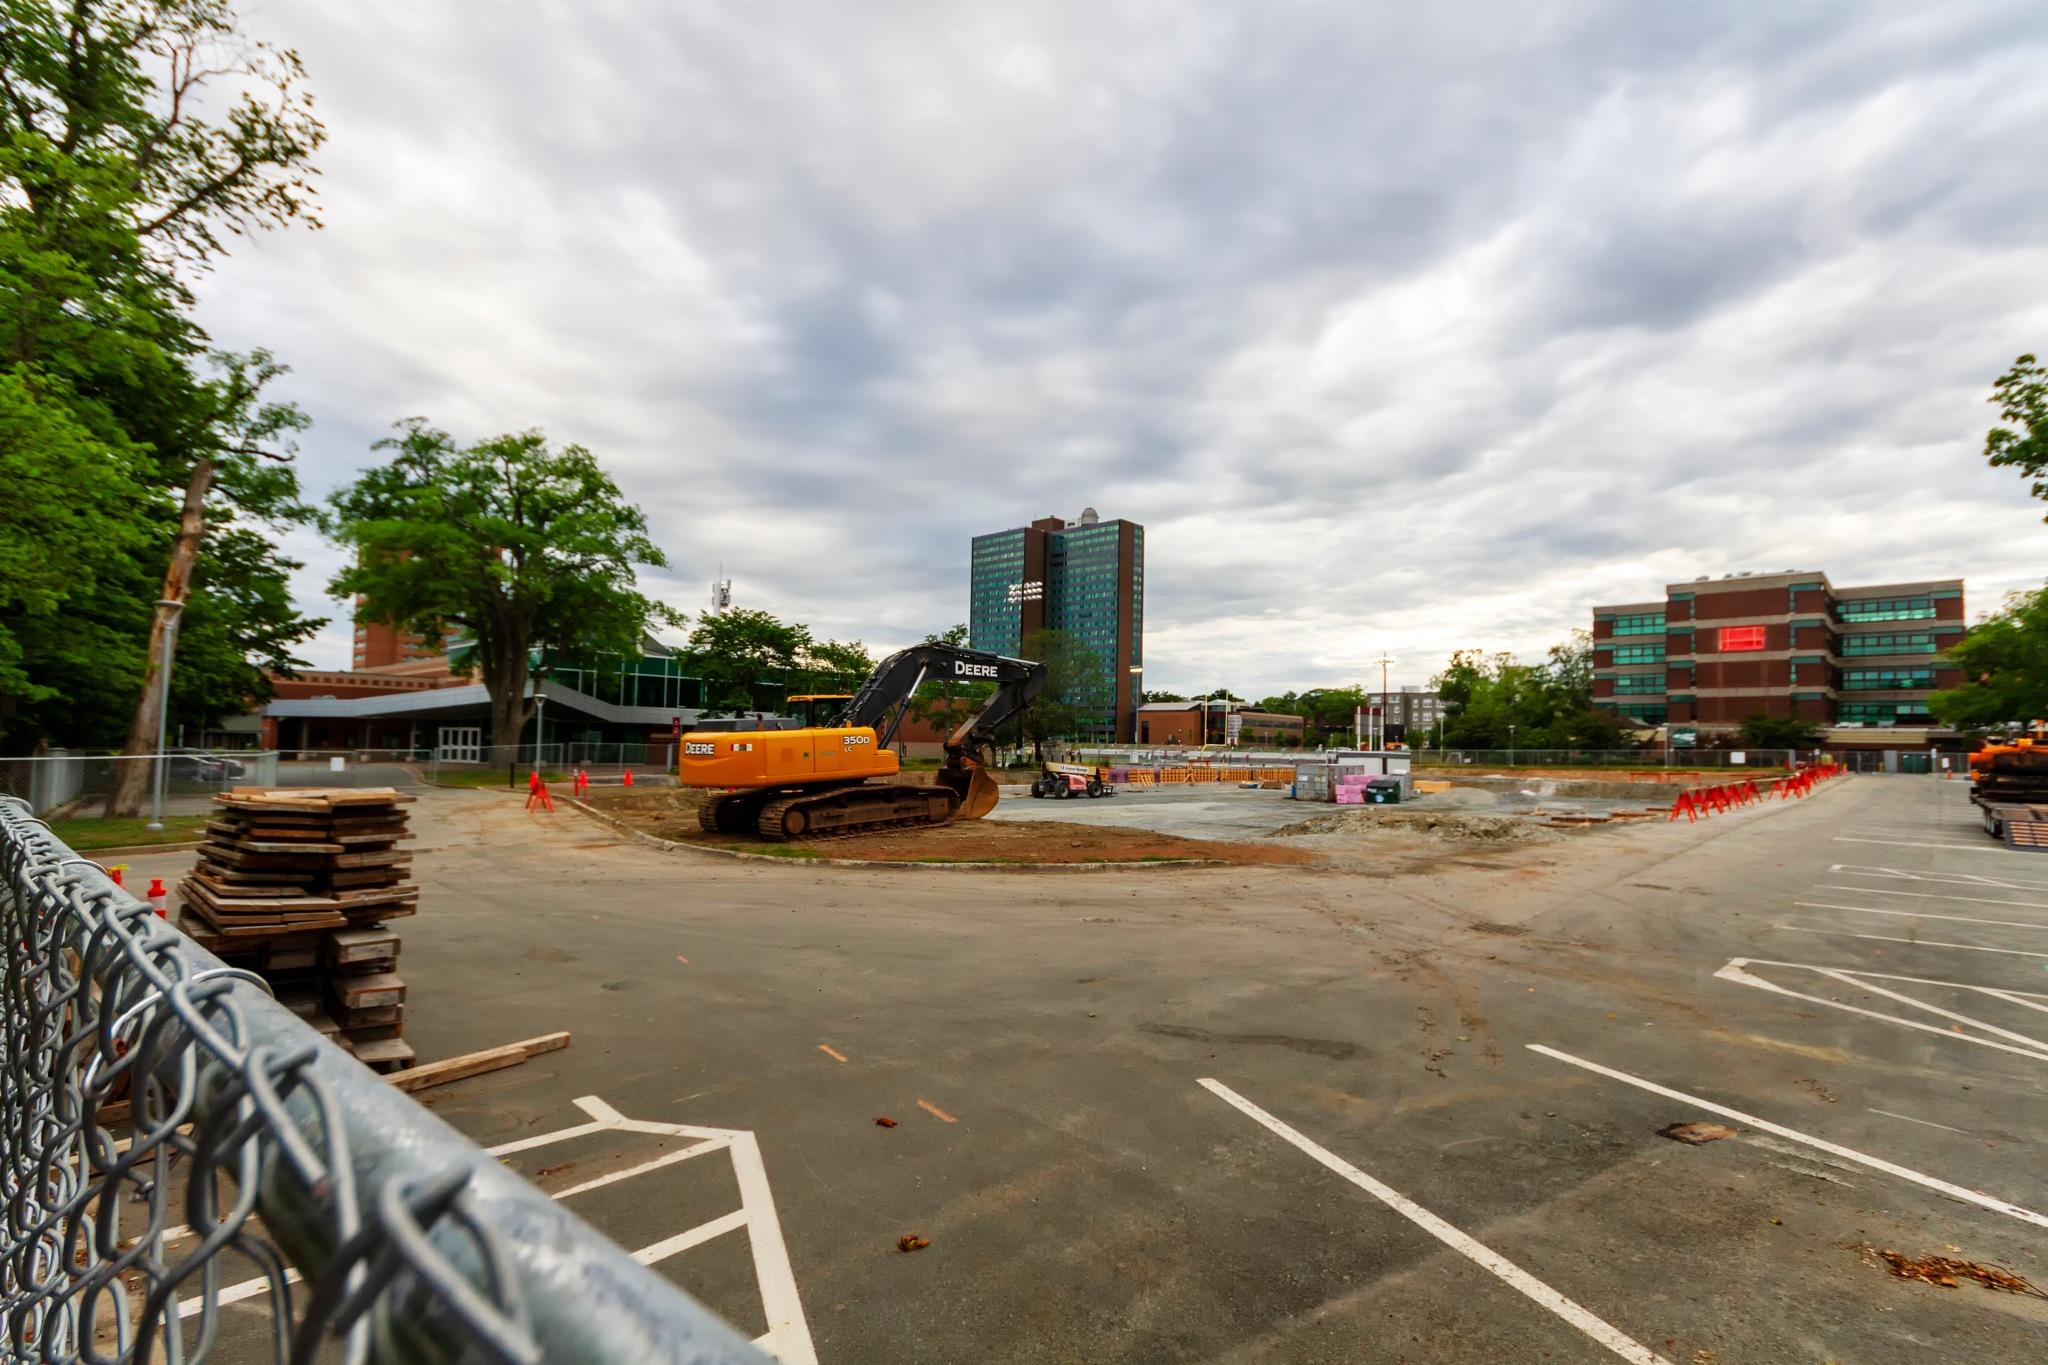 Arena Construction by Joe Chrvala